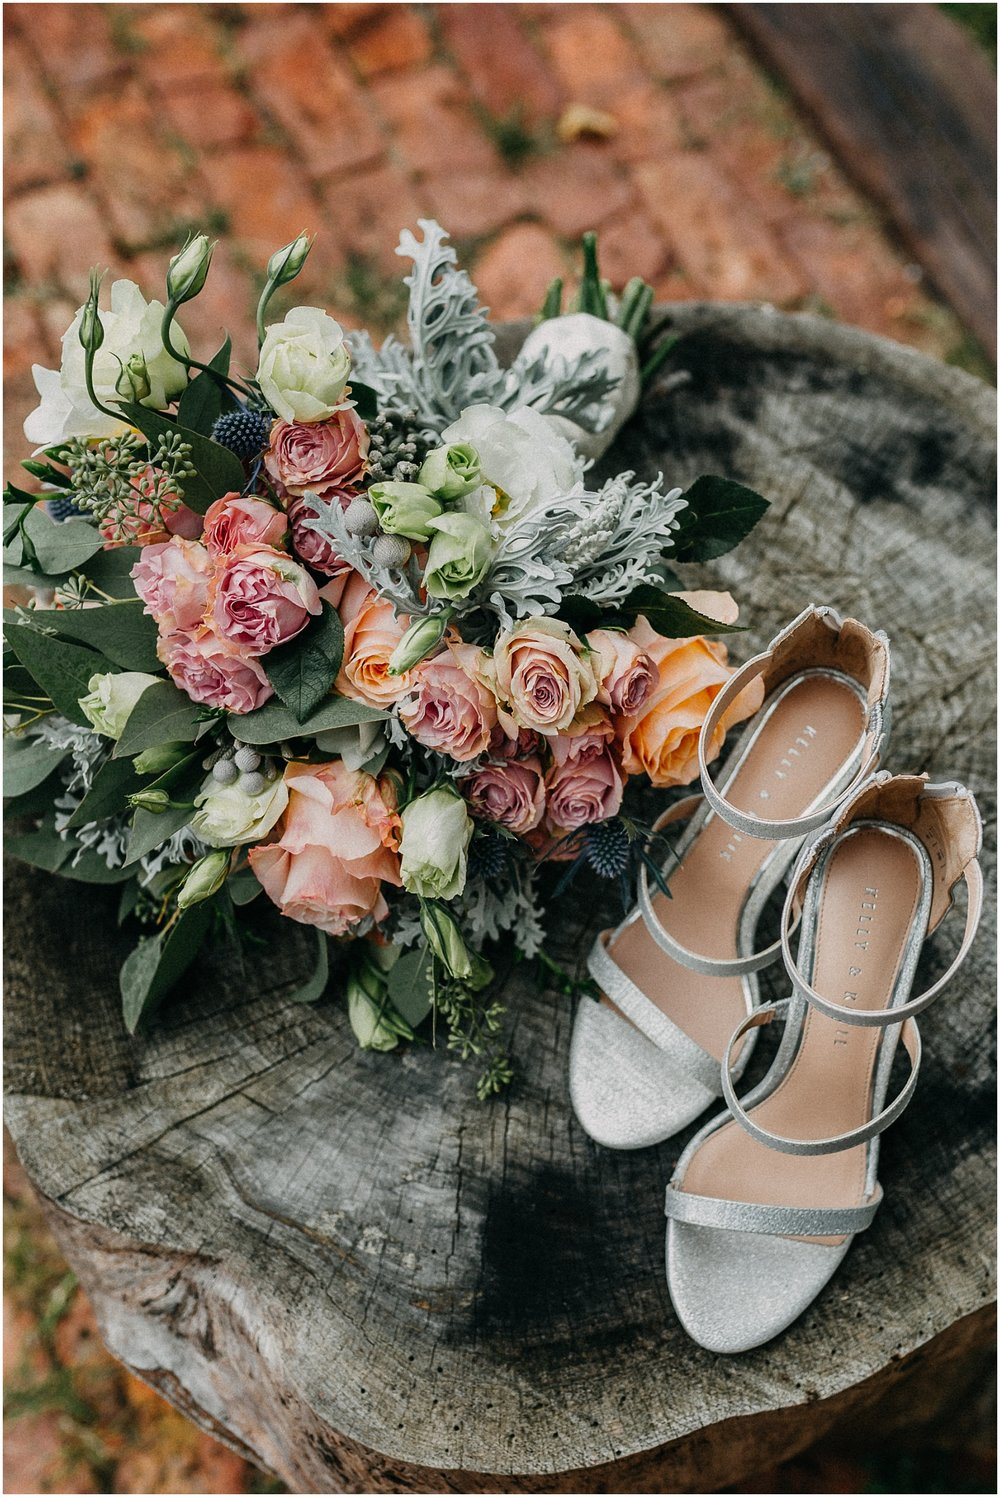 waterloo-village-waterloo village-wedding-outdoor wedding-rustic-boemian-new jersey-bride-groom-wedding party-davids bridal-wedding dress-wedding-first kiss-intimate wedding_0352.jpg